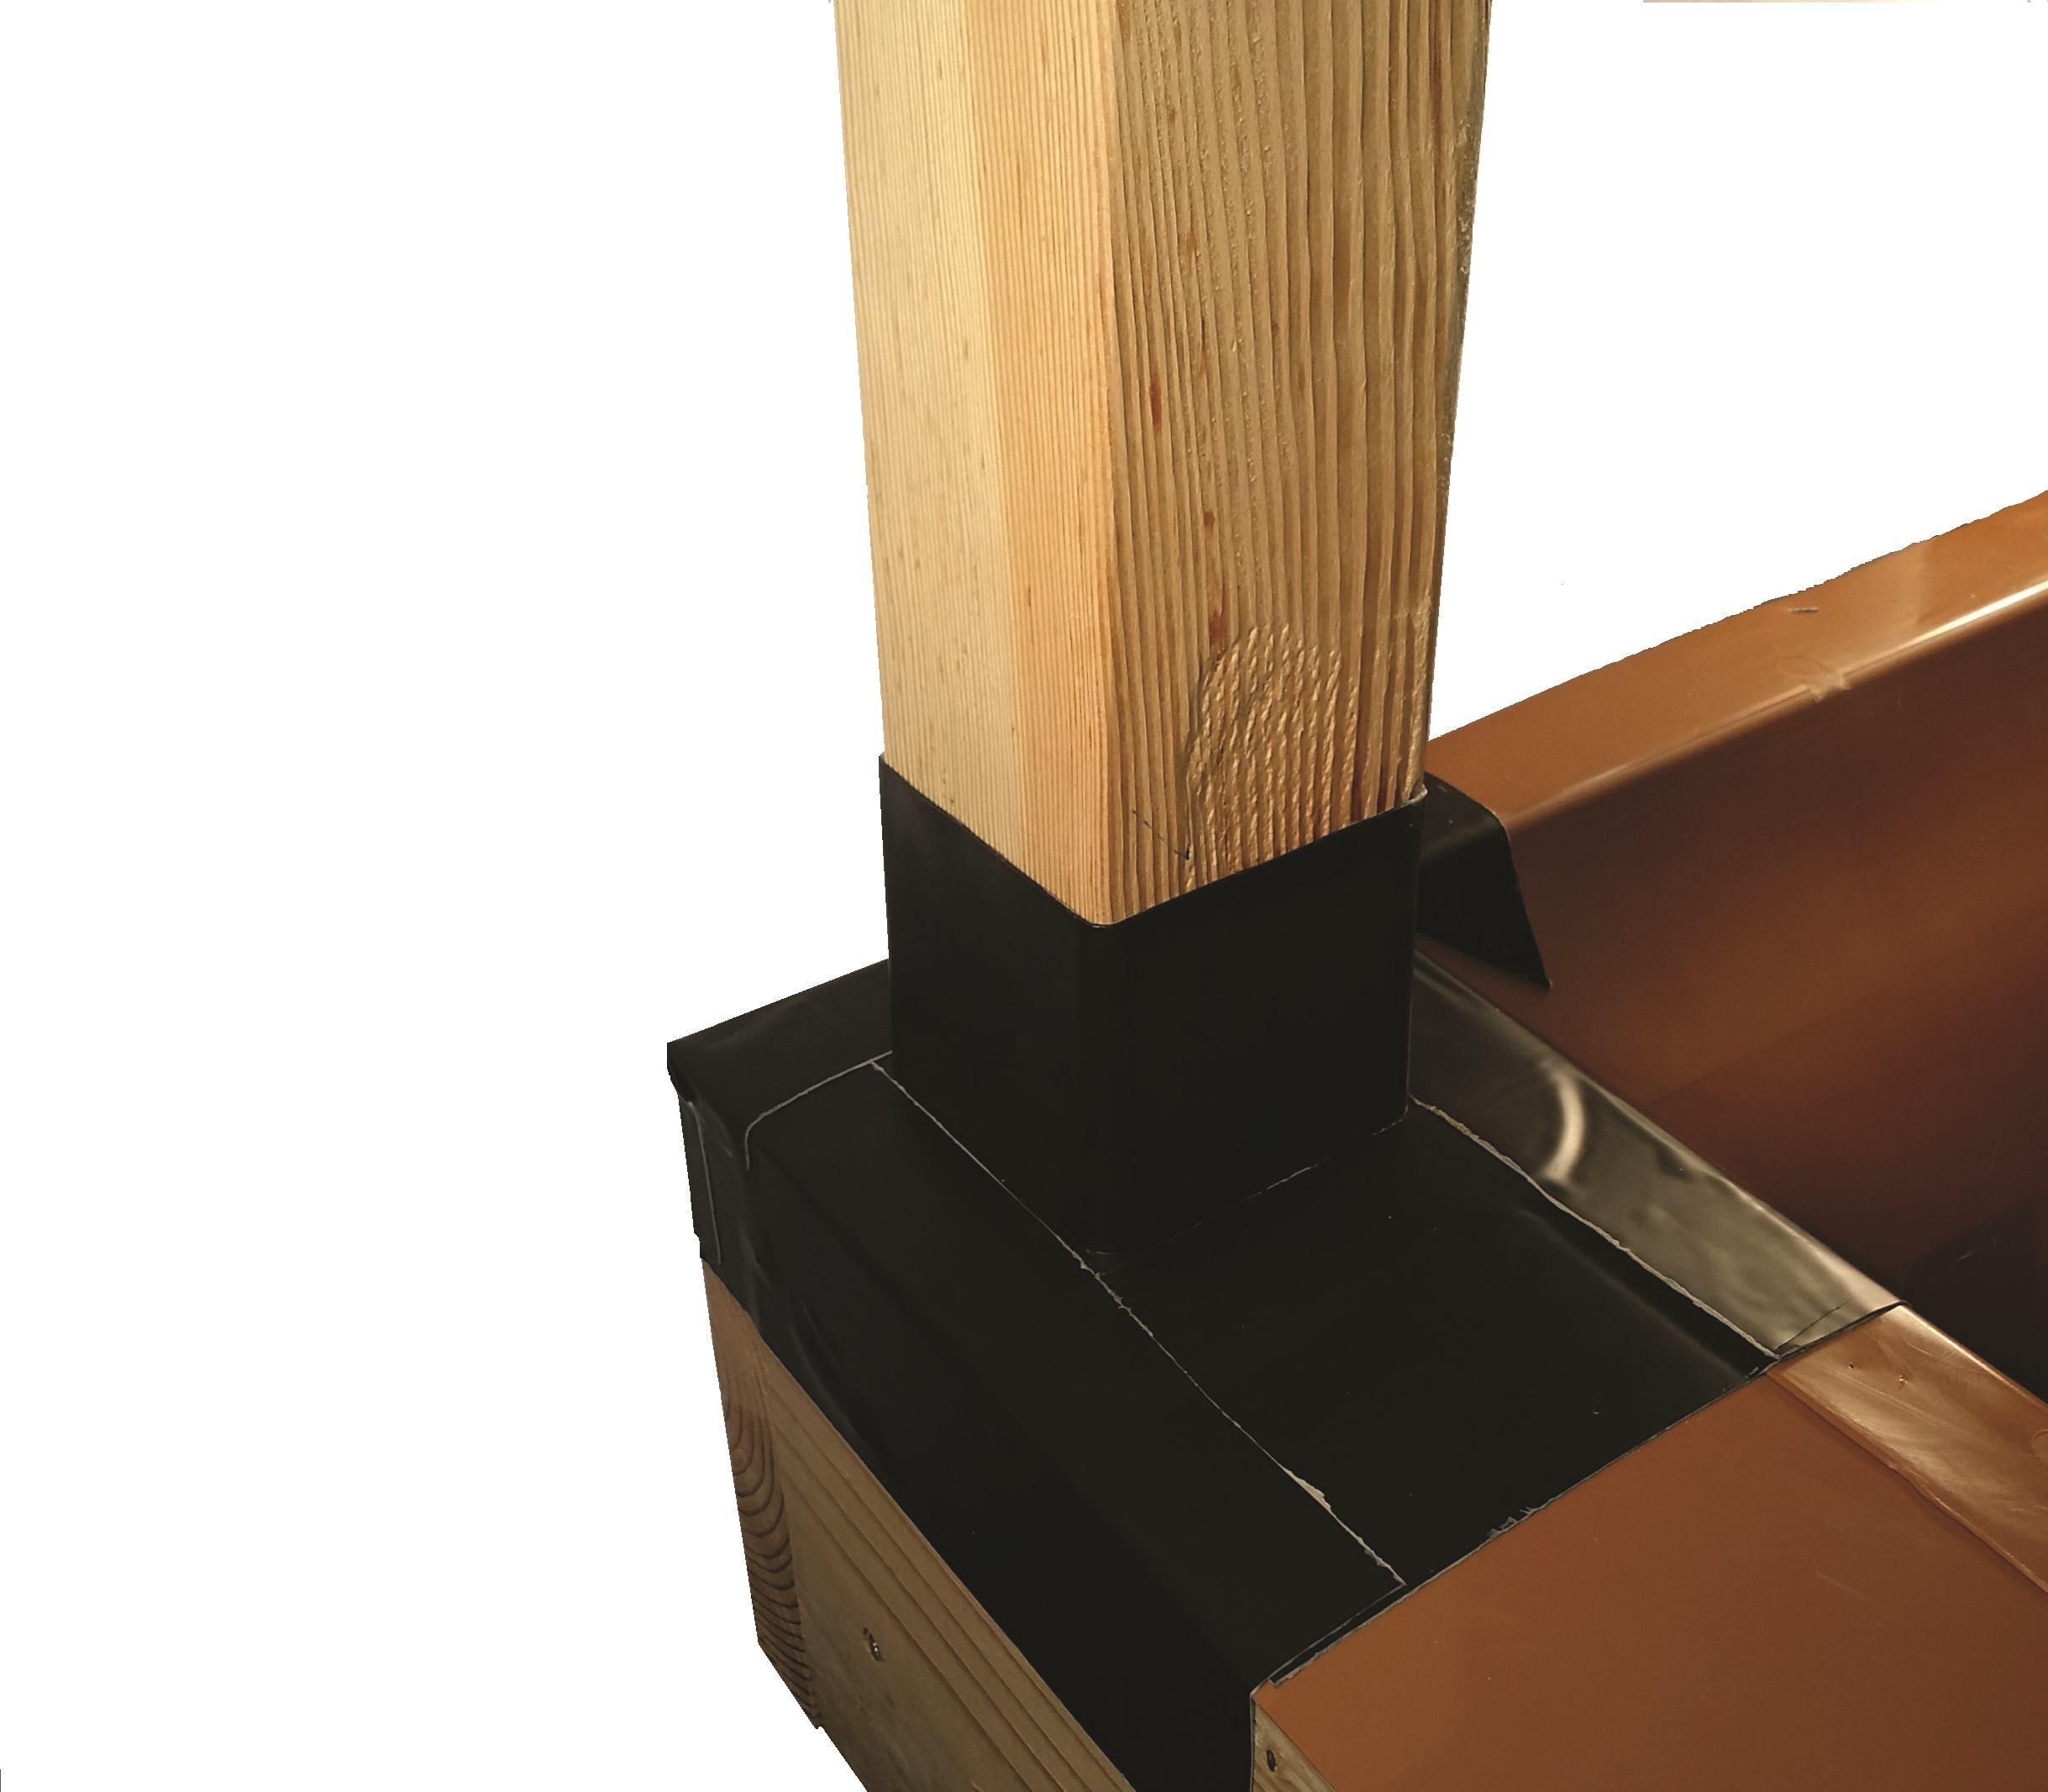 Post Flashing Professional Deck Builder Waterproofing